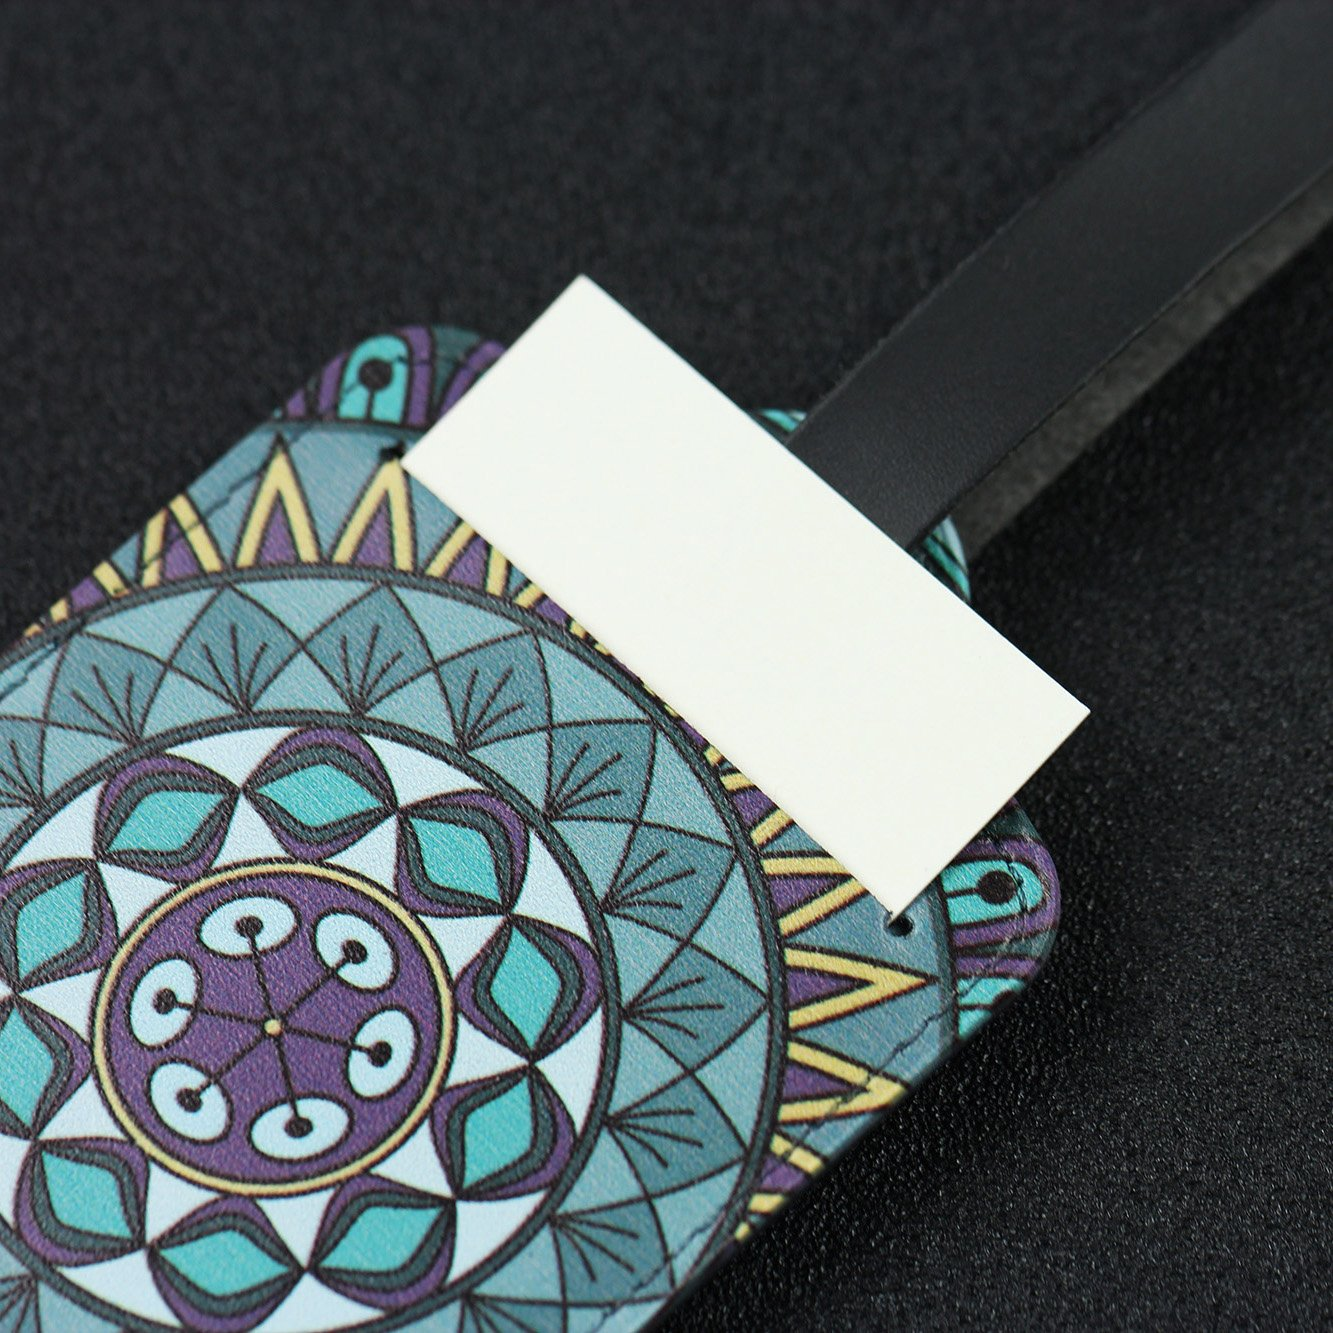 Lizimandu 4 Pack PU Leather Luggage Tags Suitcase Labels Bag Travel Accessories Van Gogh Flower Set of 4